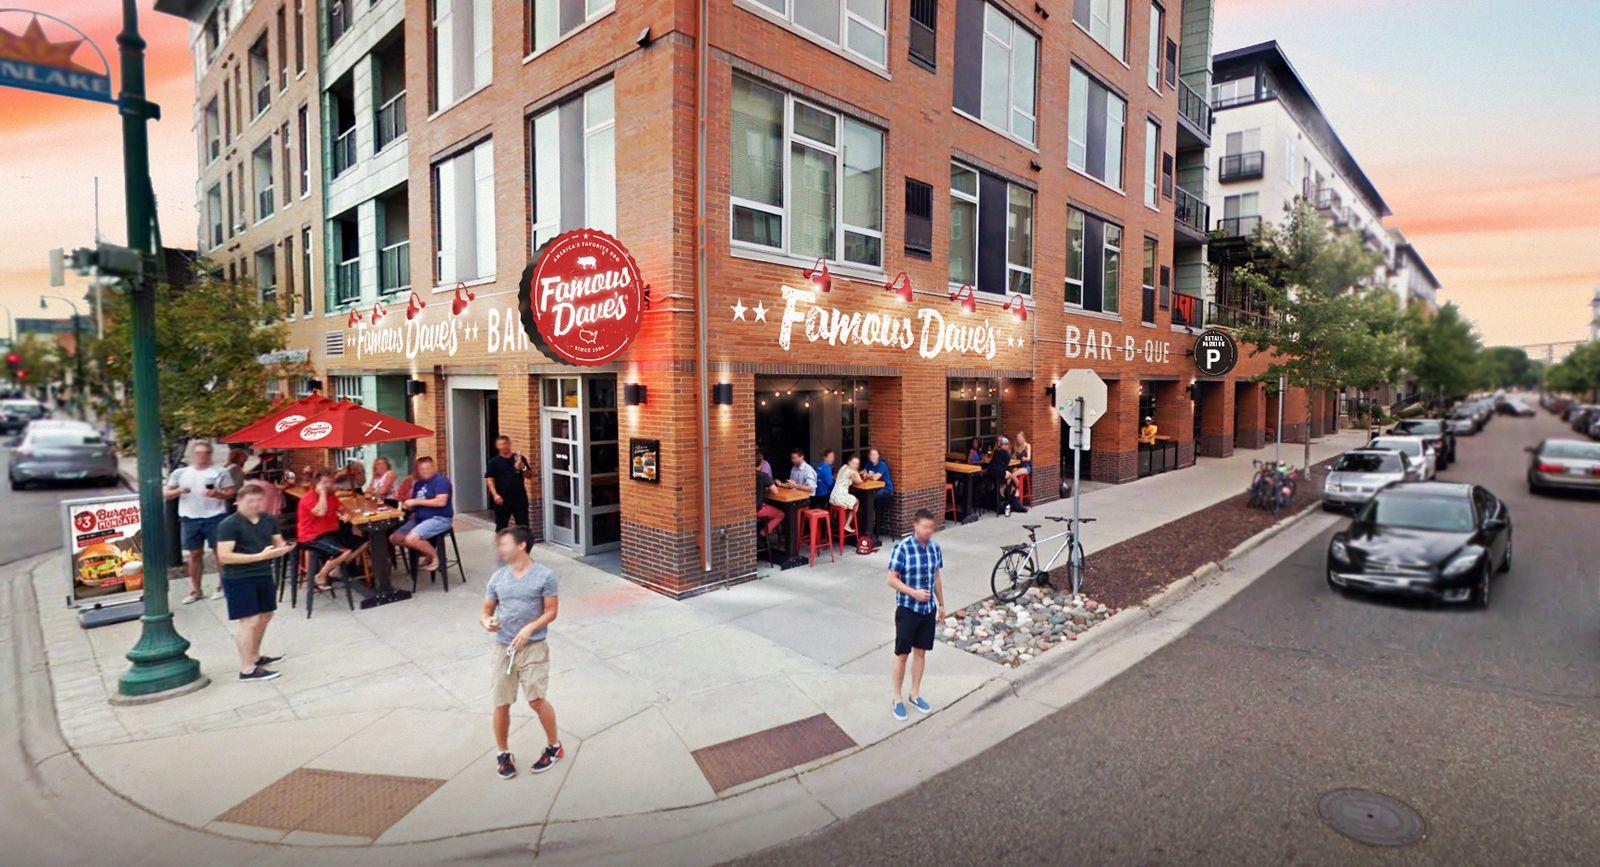 Famous Dave's Reveals New, Smaller Footprint Prototype Restaurant in Uptown, Minneapolis on December 20